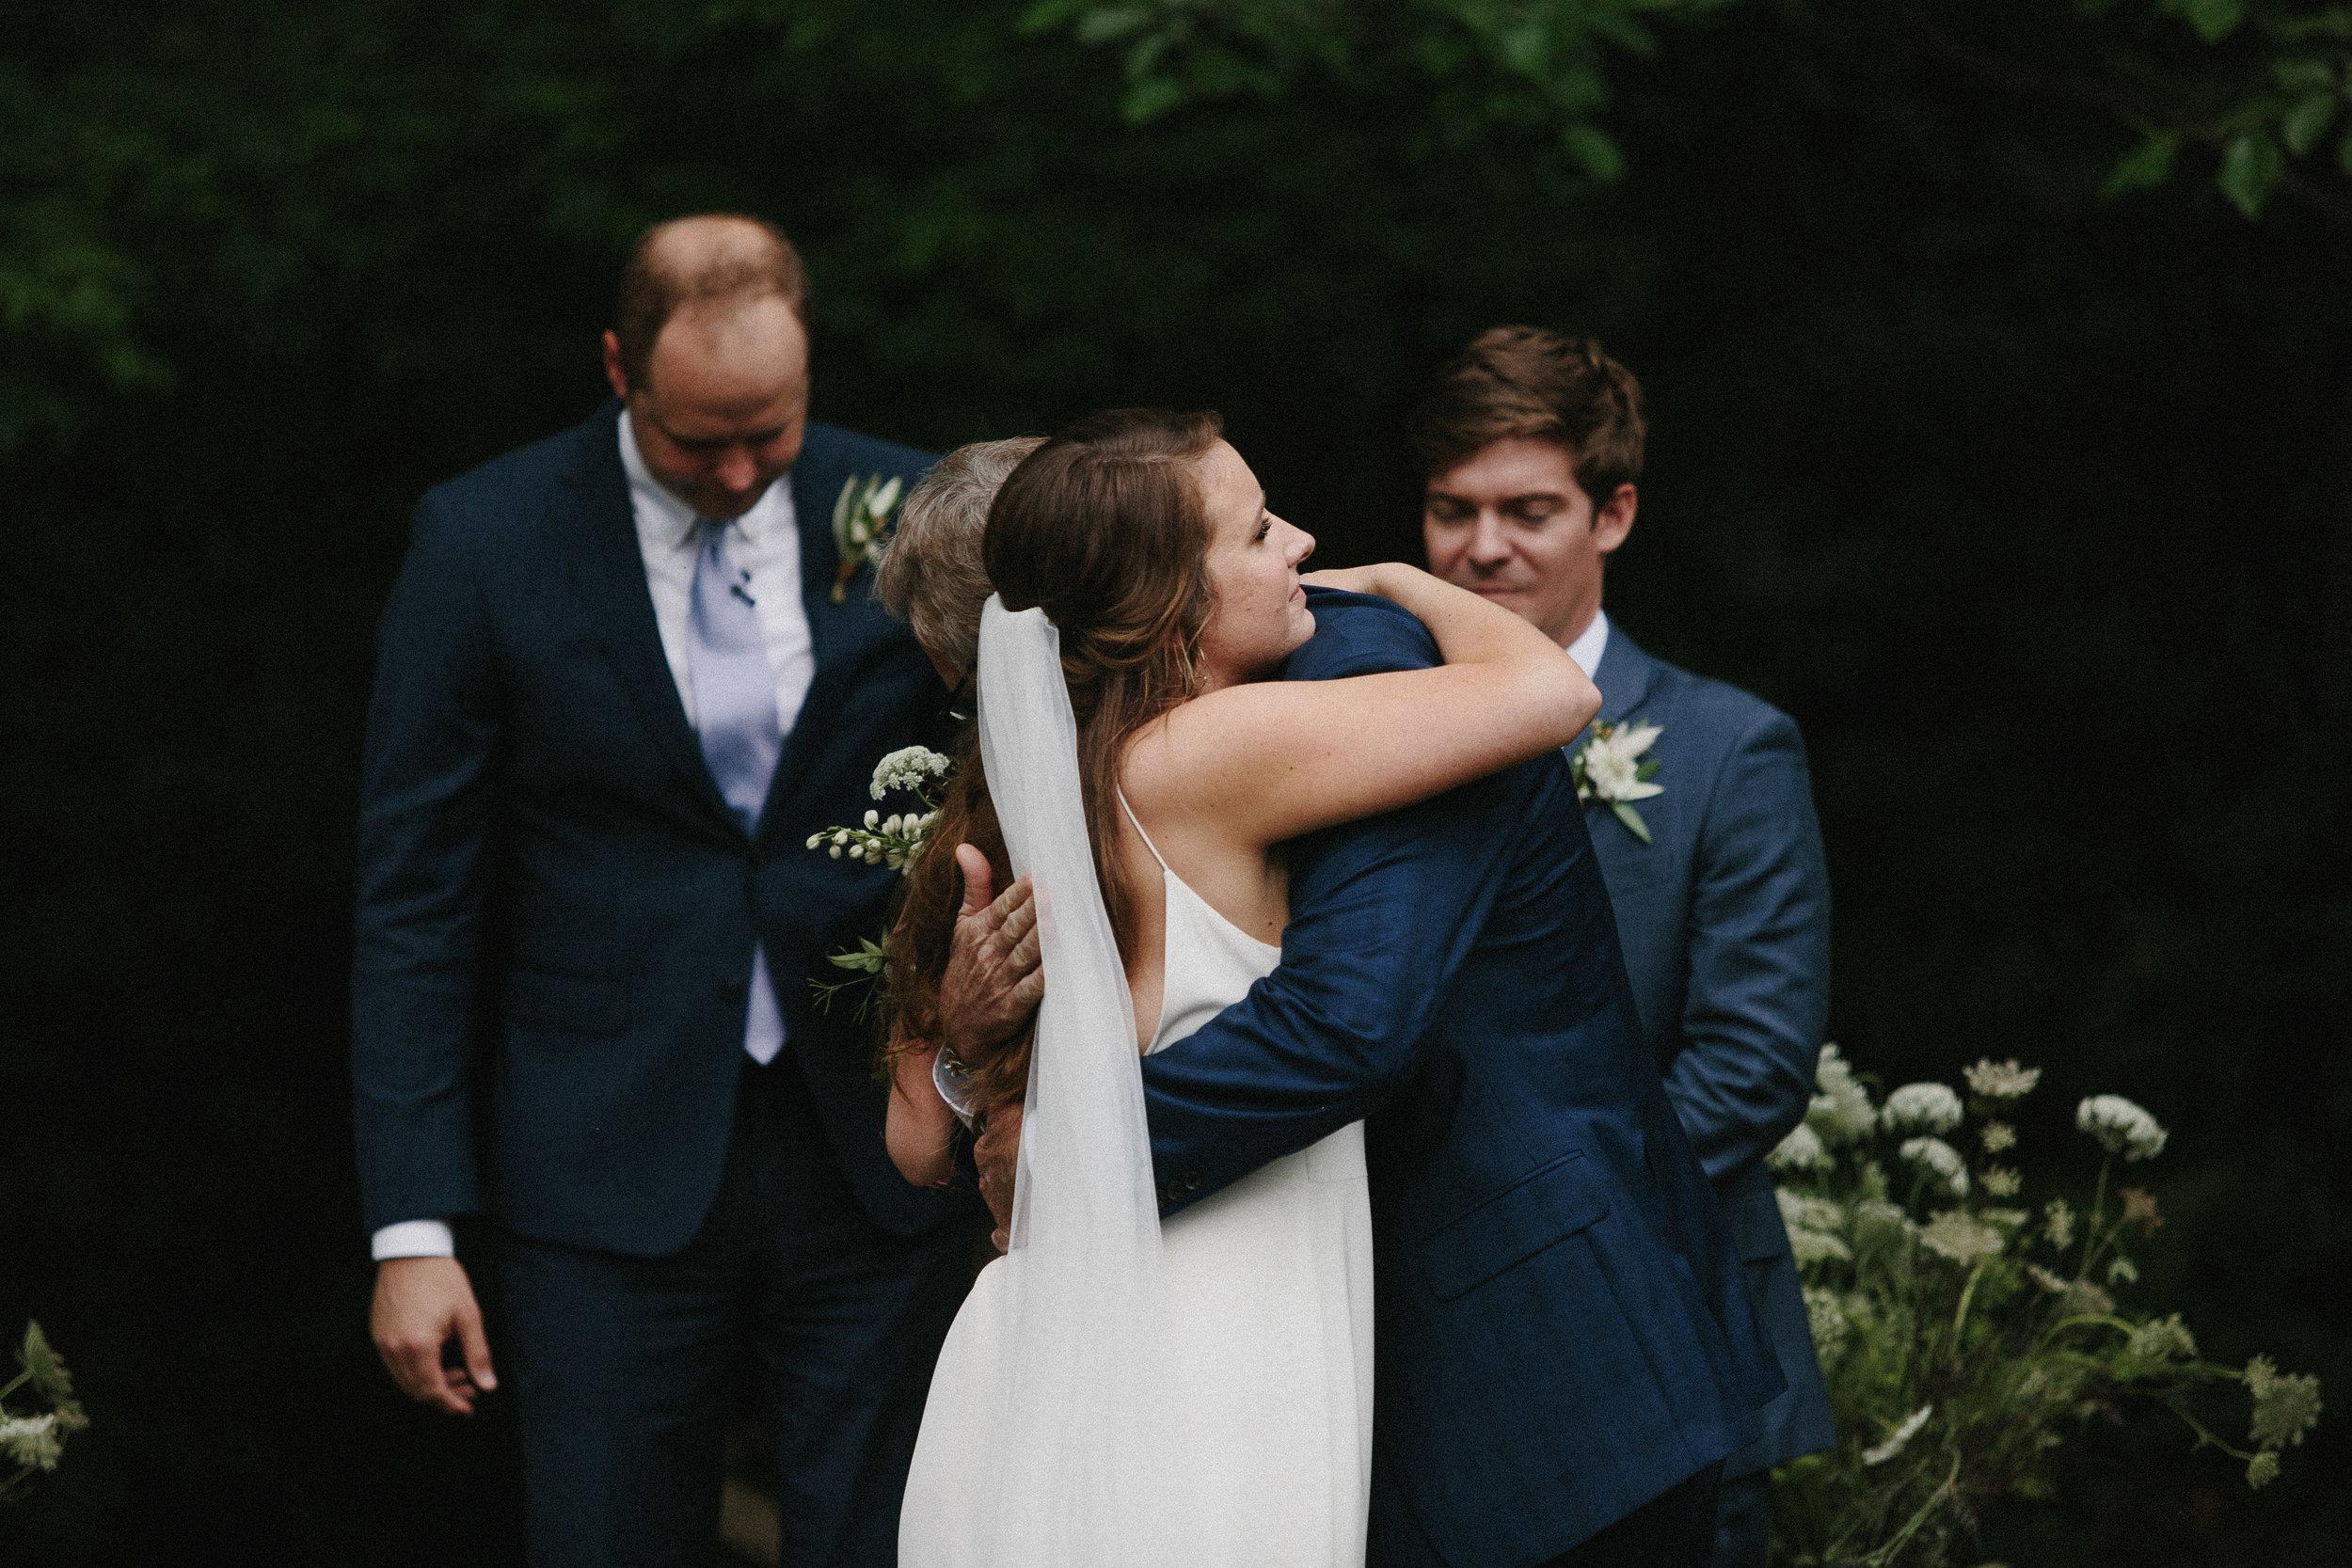 glen_ella_meadow_creekside_atlanta_wedding_photographers_1685.jpg